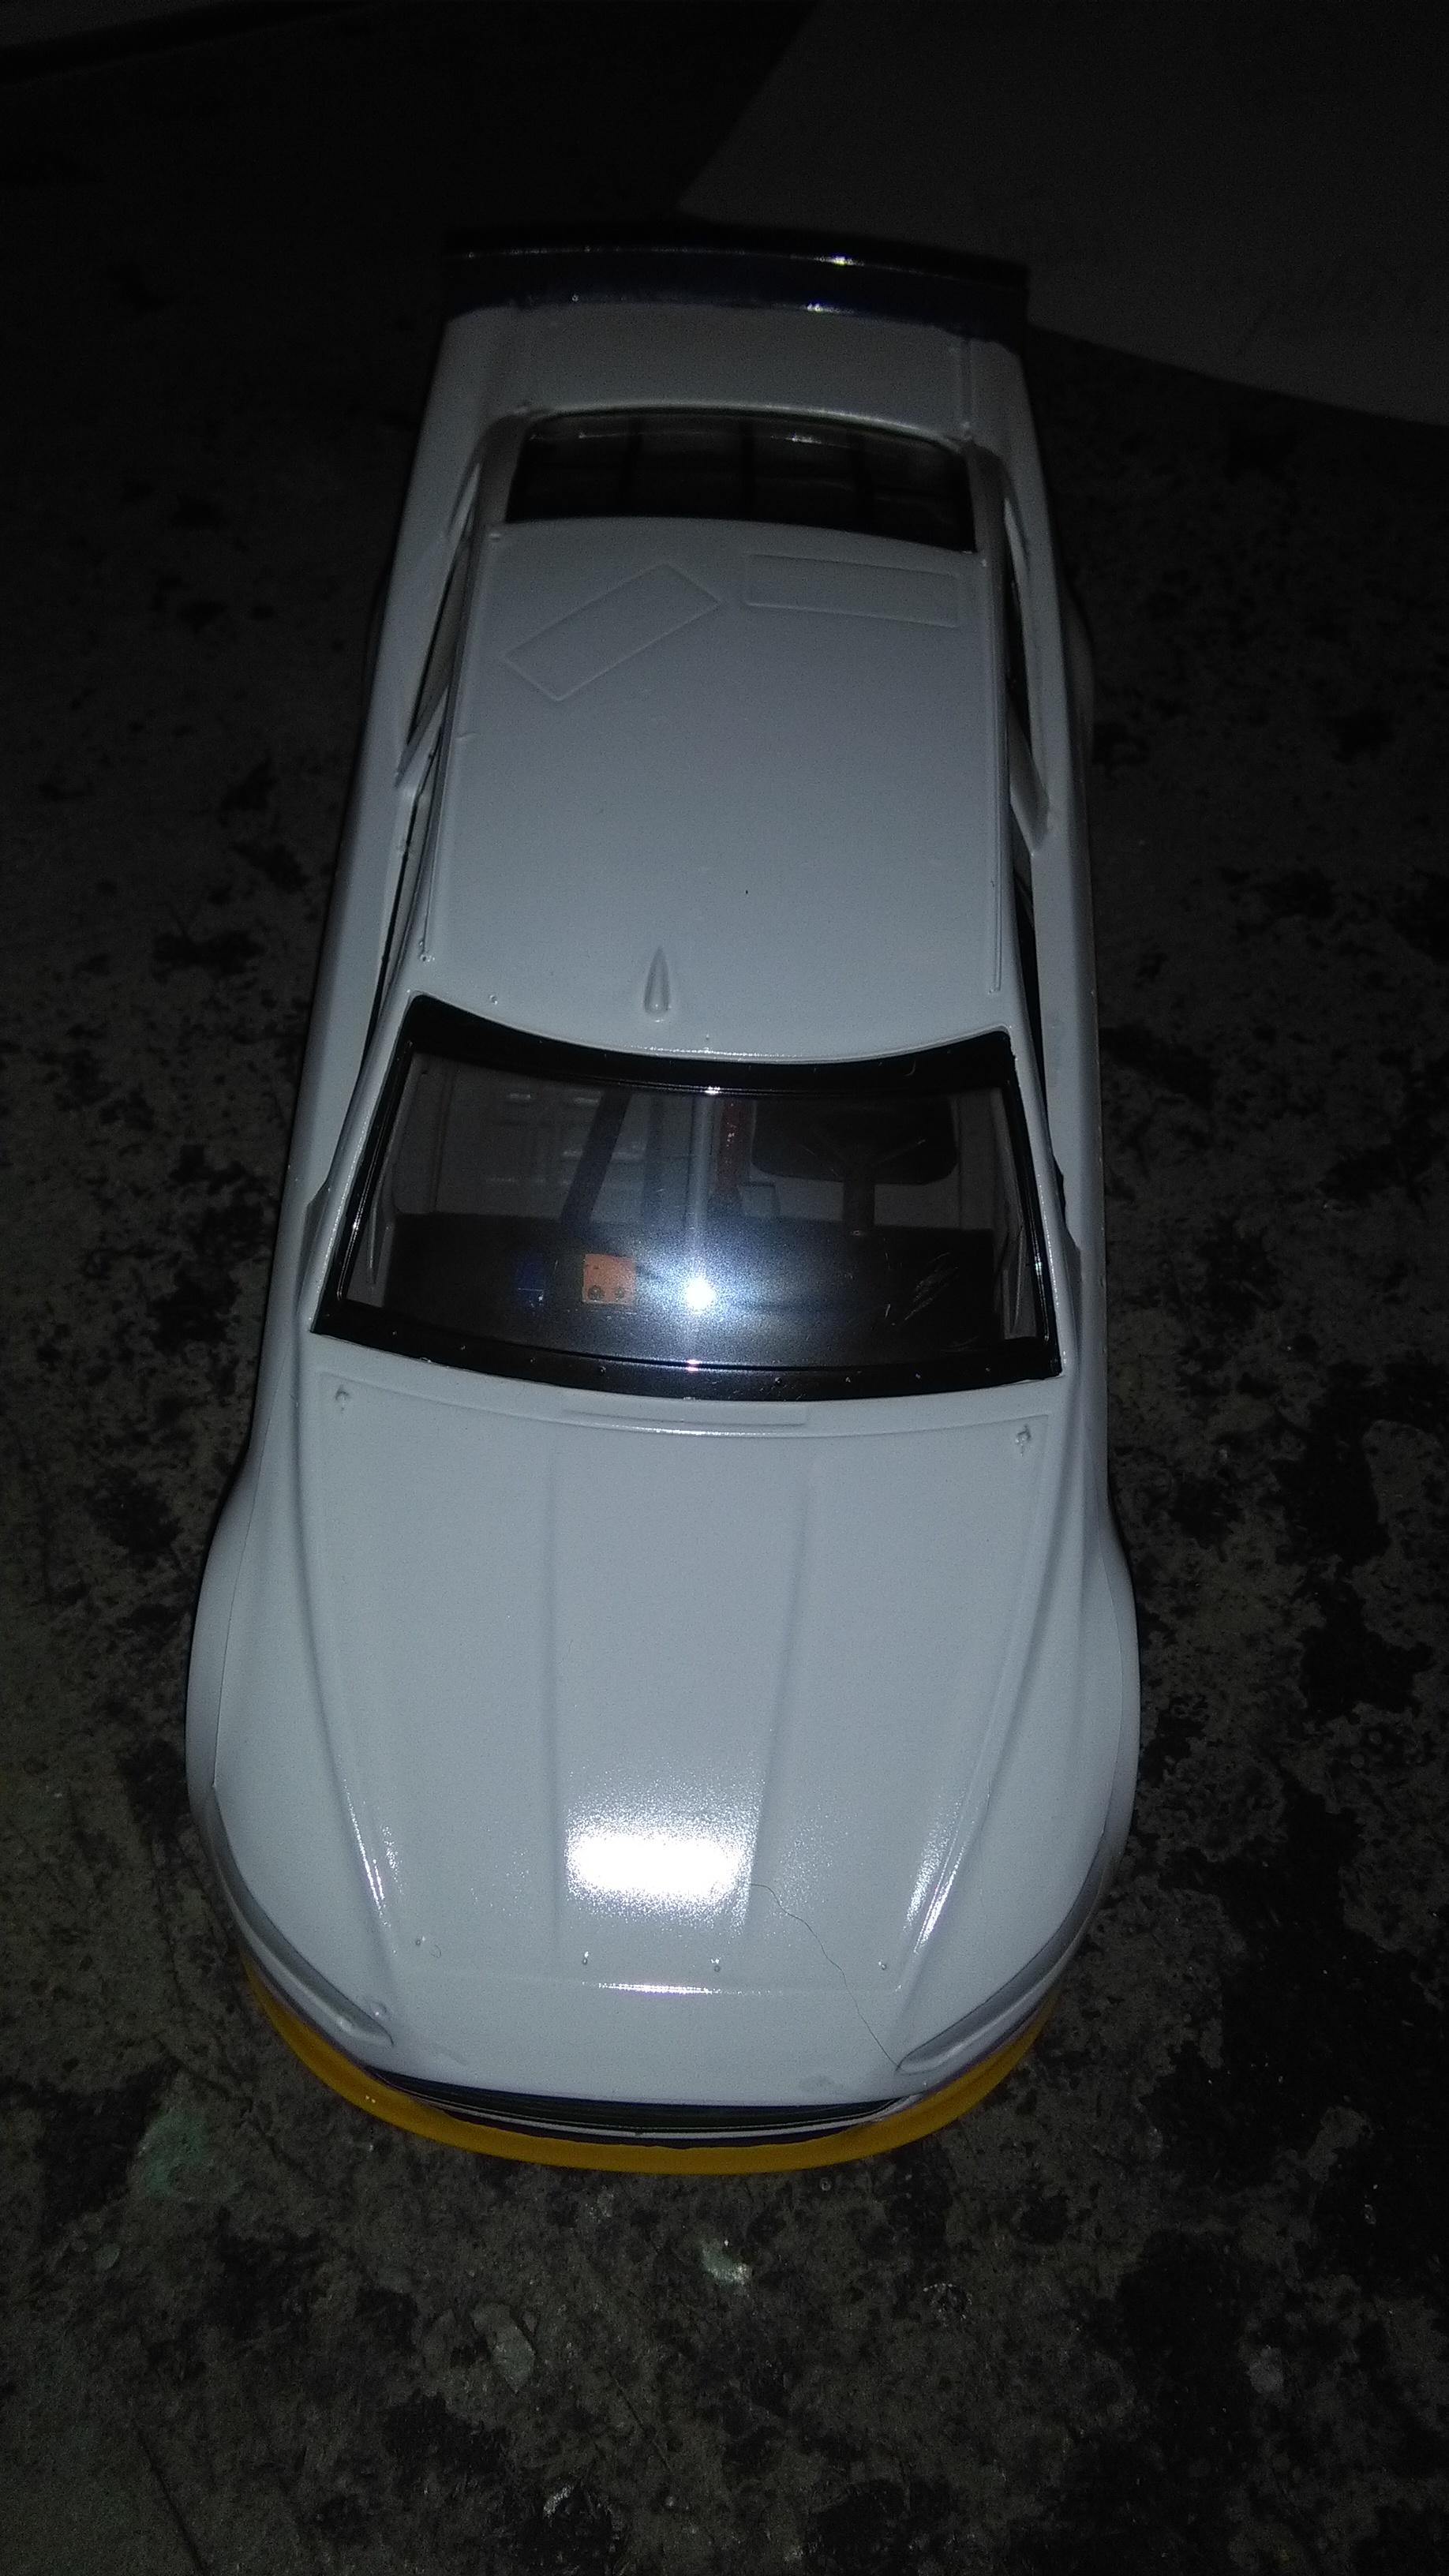 Ford Fusion Penskee 2014 #2 Brad K. Miller Lite - CHASE Version 588596F2013213